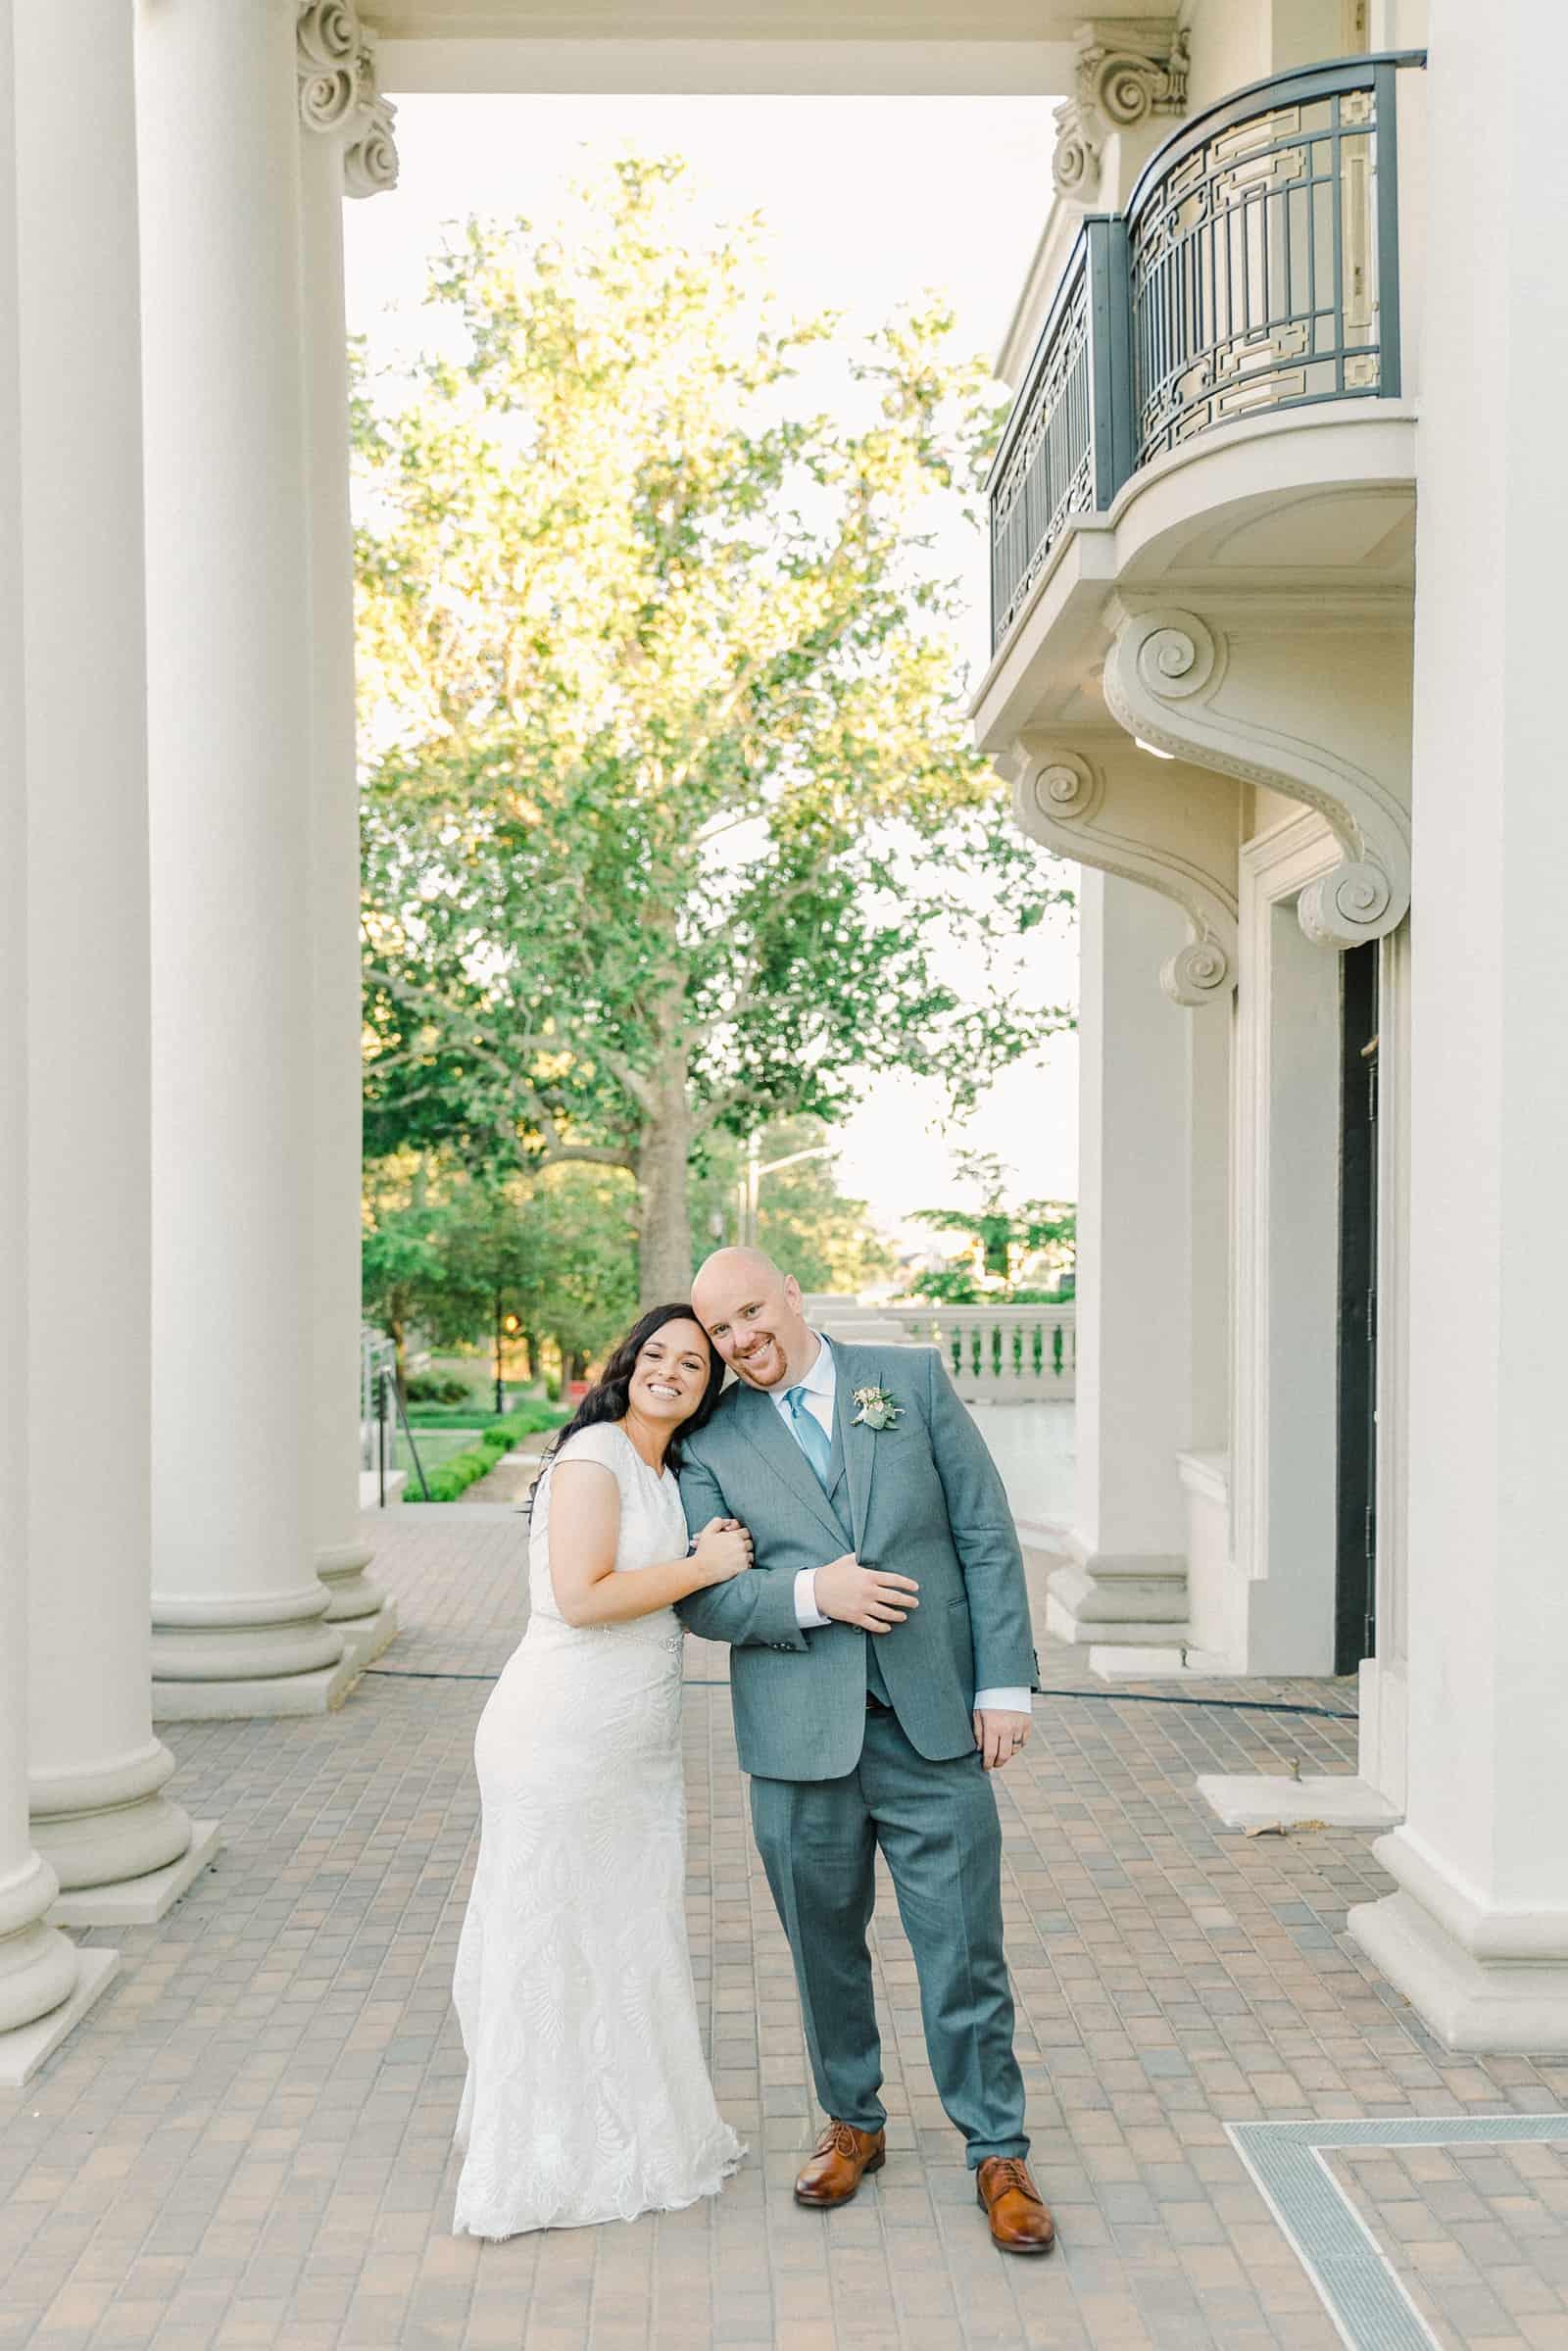 Thomas S. Monson Center Wedding, Salt Lake LDS Temple Wedding, Utah wedding photography, bride and groom